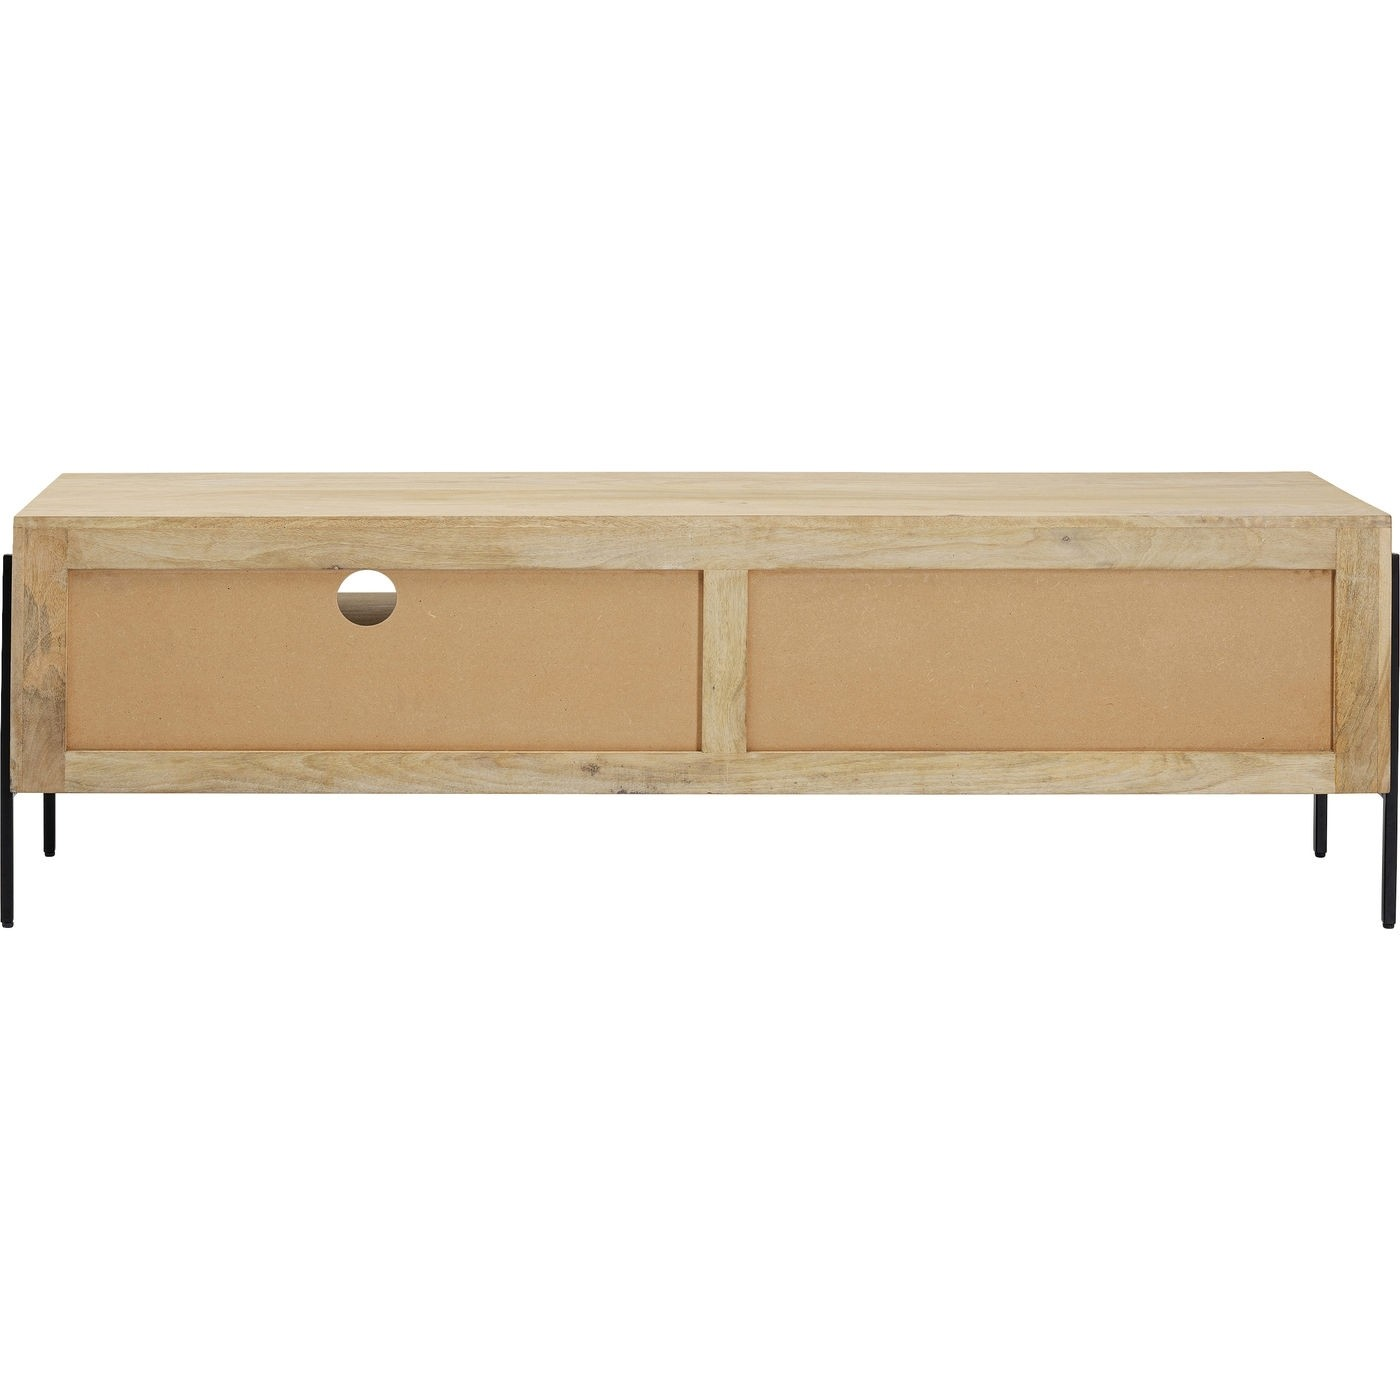 KARE DESIGN rektangulær Modena TV-bord, m. låge og skuffe - natur mangotræ og aluminium (160x40)